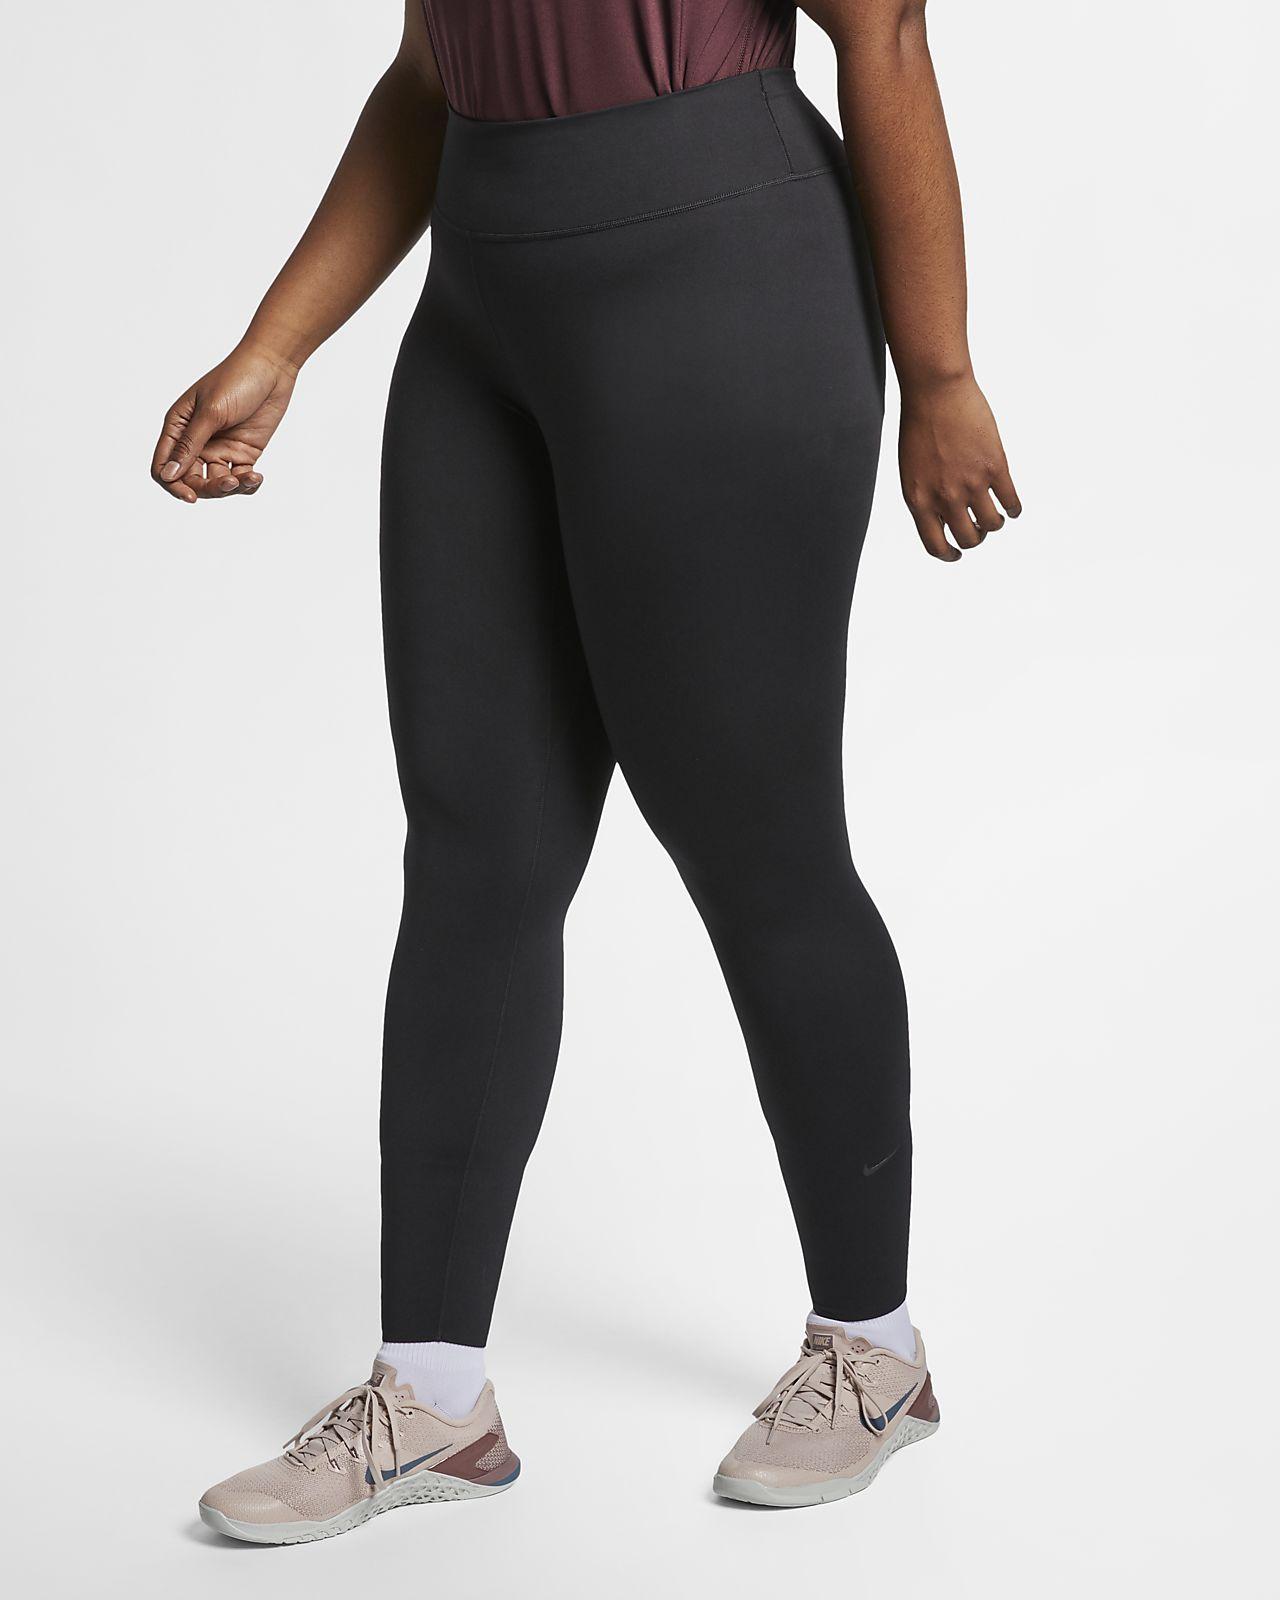 1e67bb0c49d6 Γυναικείο κολάν Nike One Luxe (μεγάλα μεγέθη). Nike.com GR